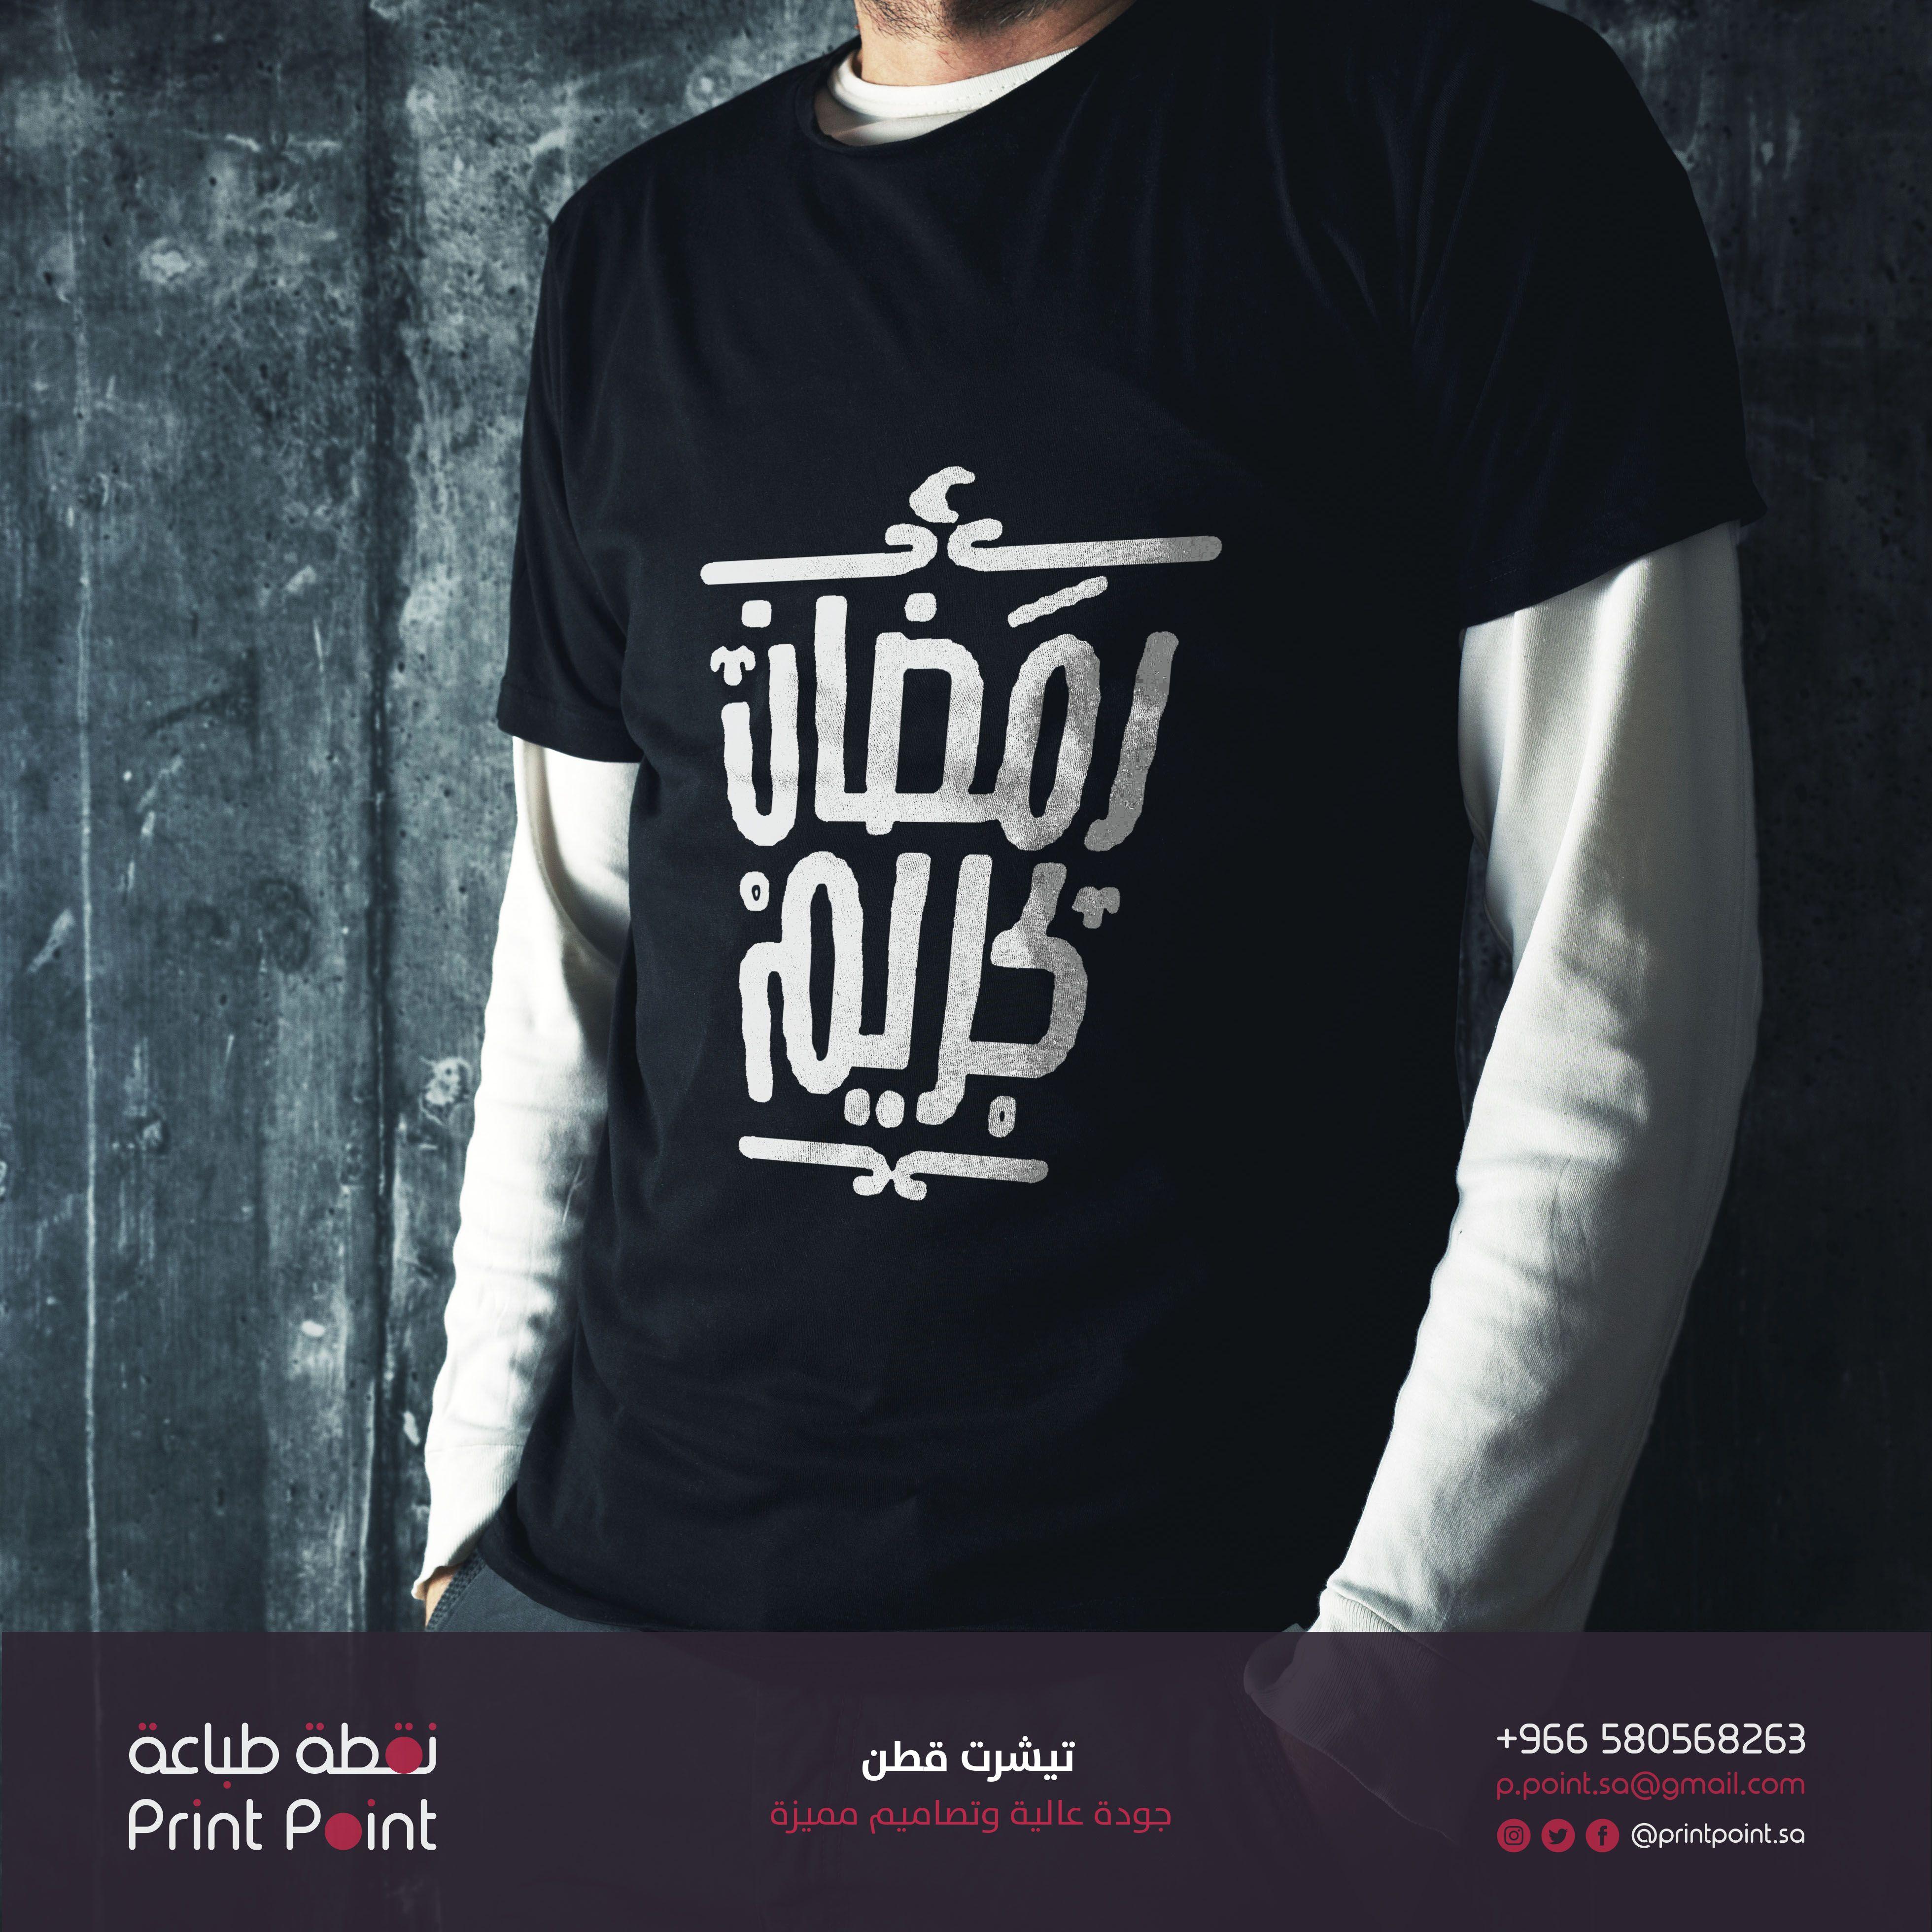 Pin By Print Point On مشروع الطباعة Mens Graphic Tshirt Mens Tshirts Mens Tops